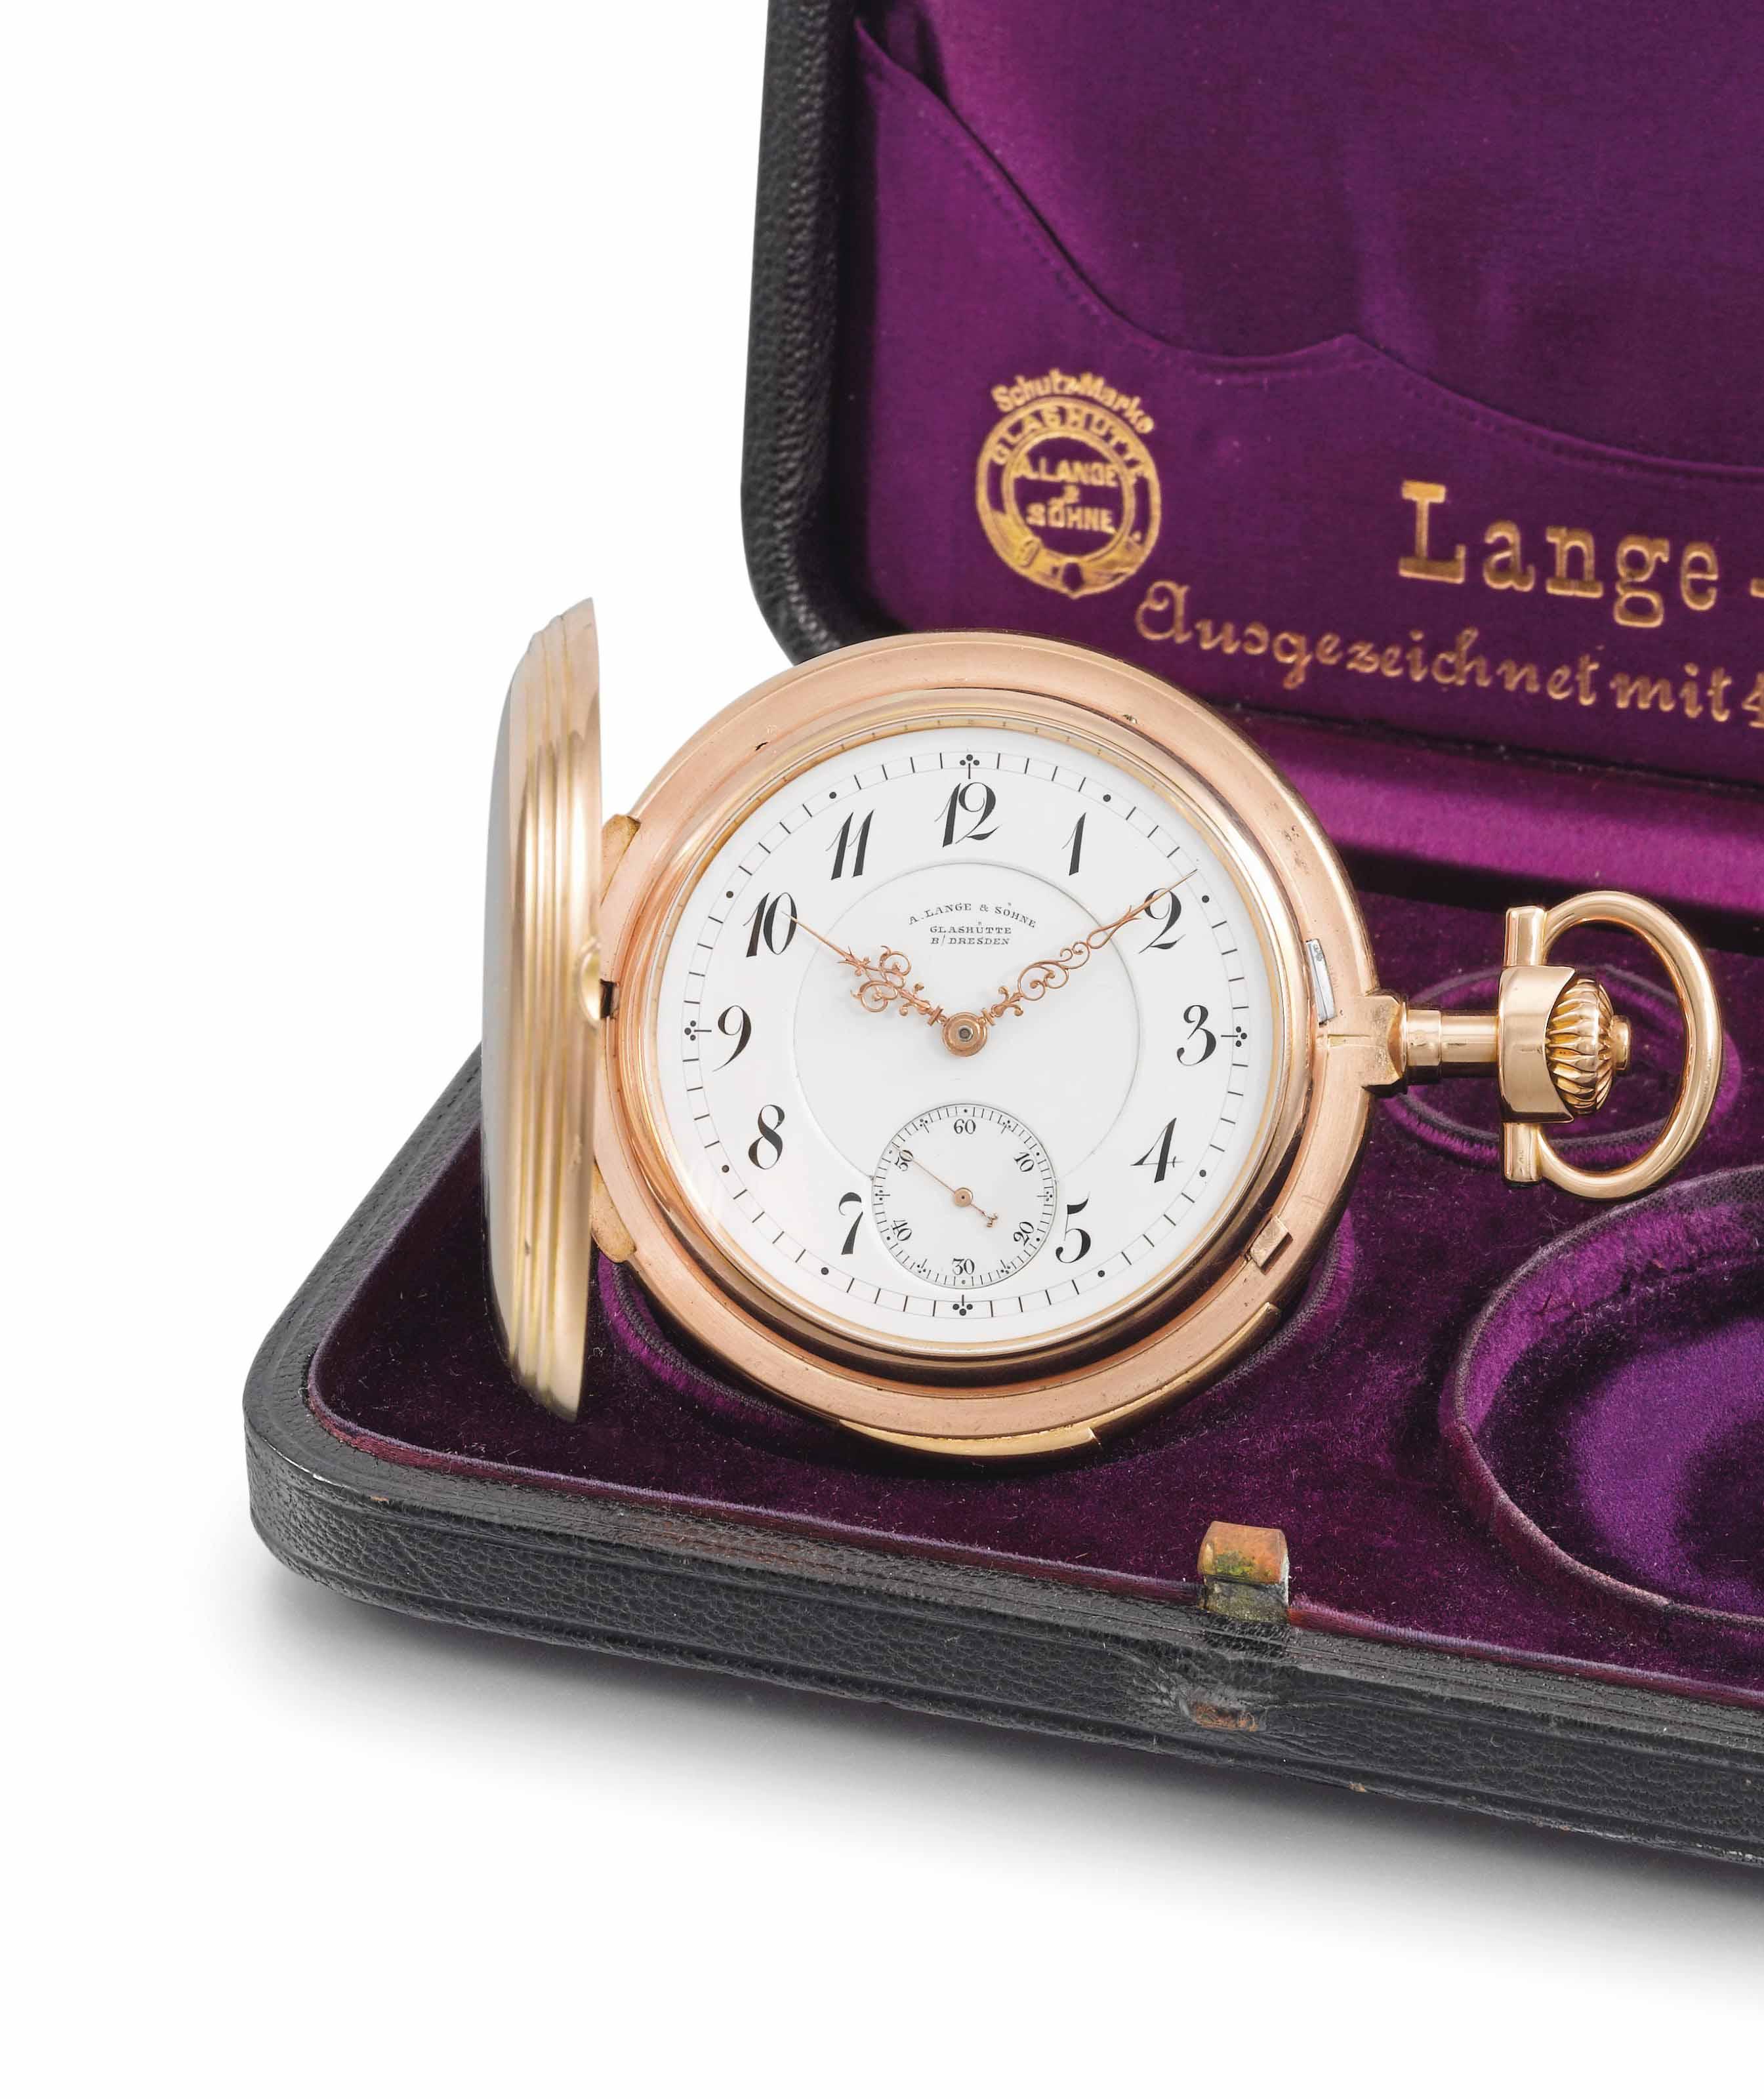 A. Lange & Söhne. A very fine